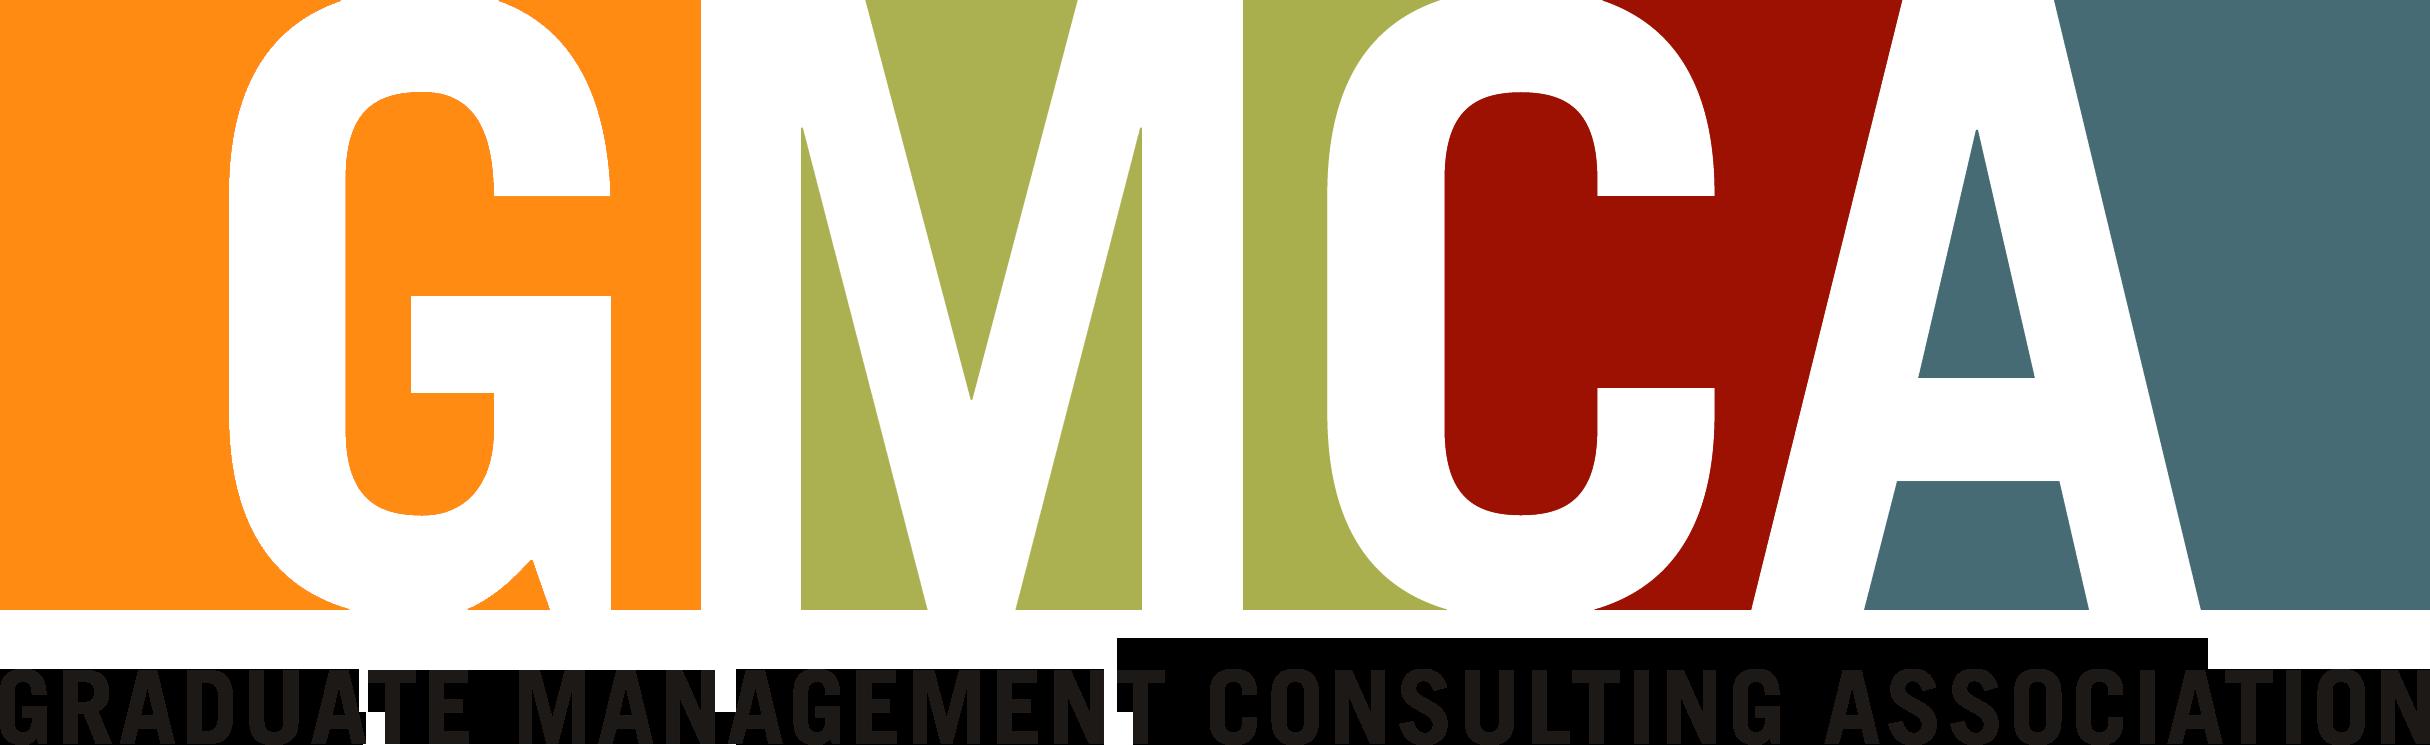 GMCA-logo.png